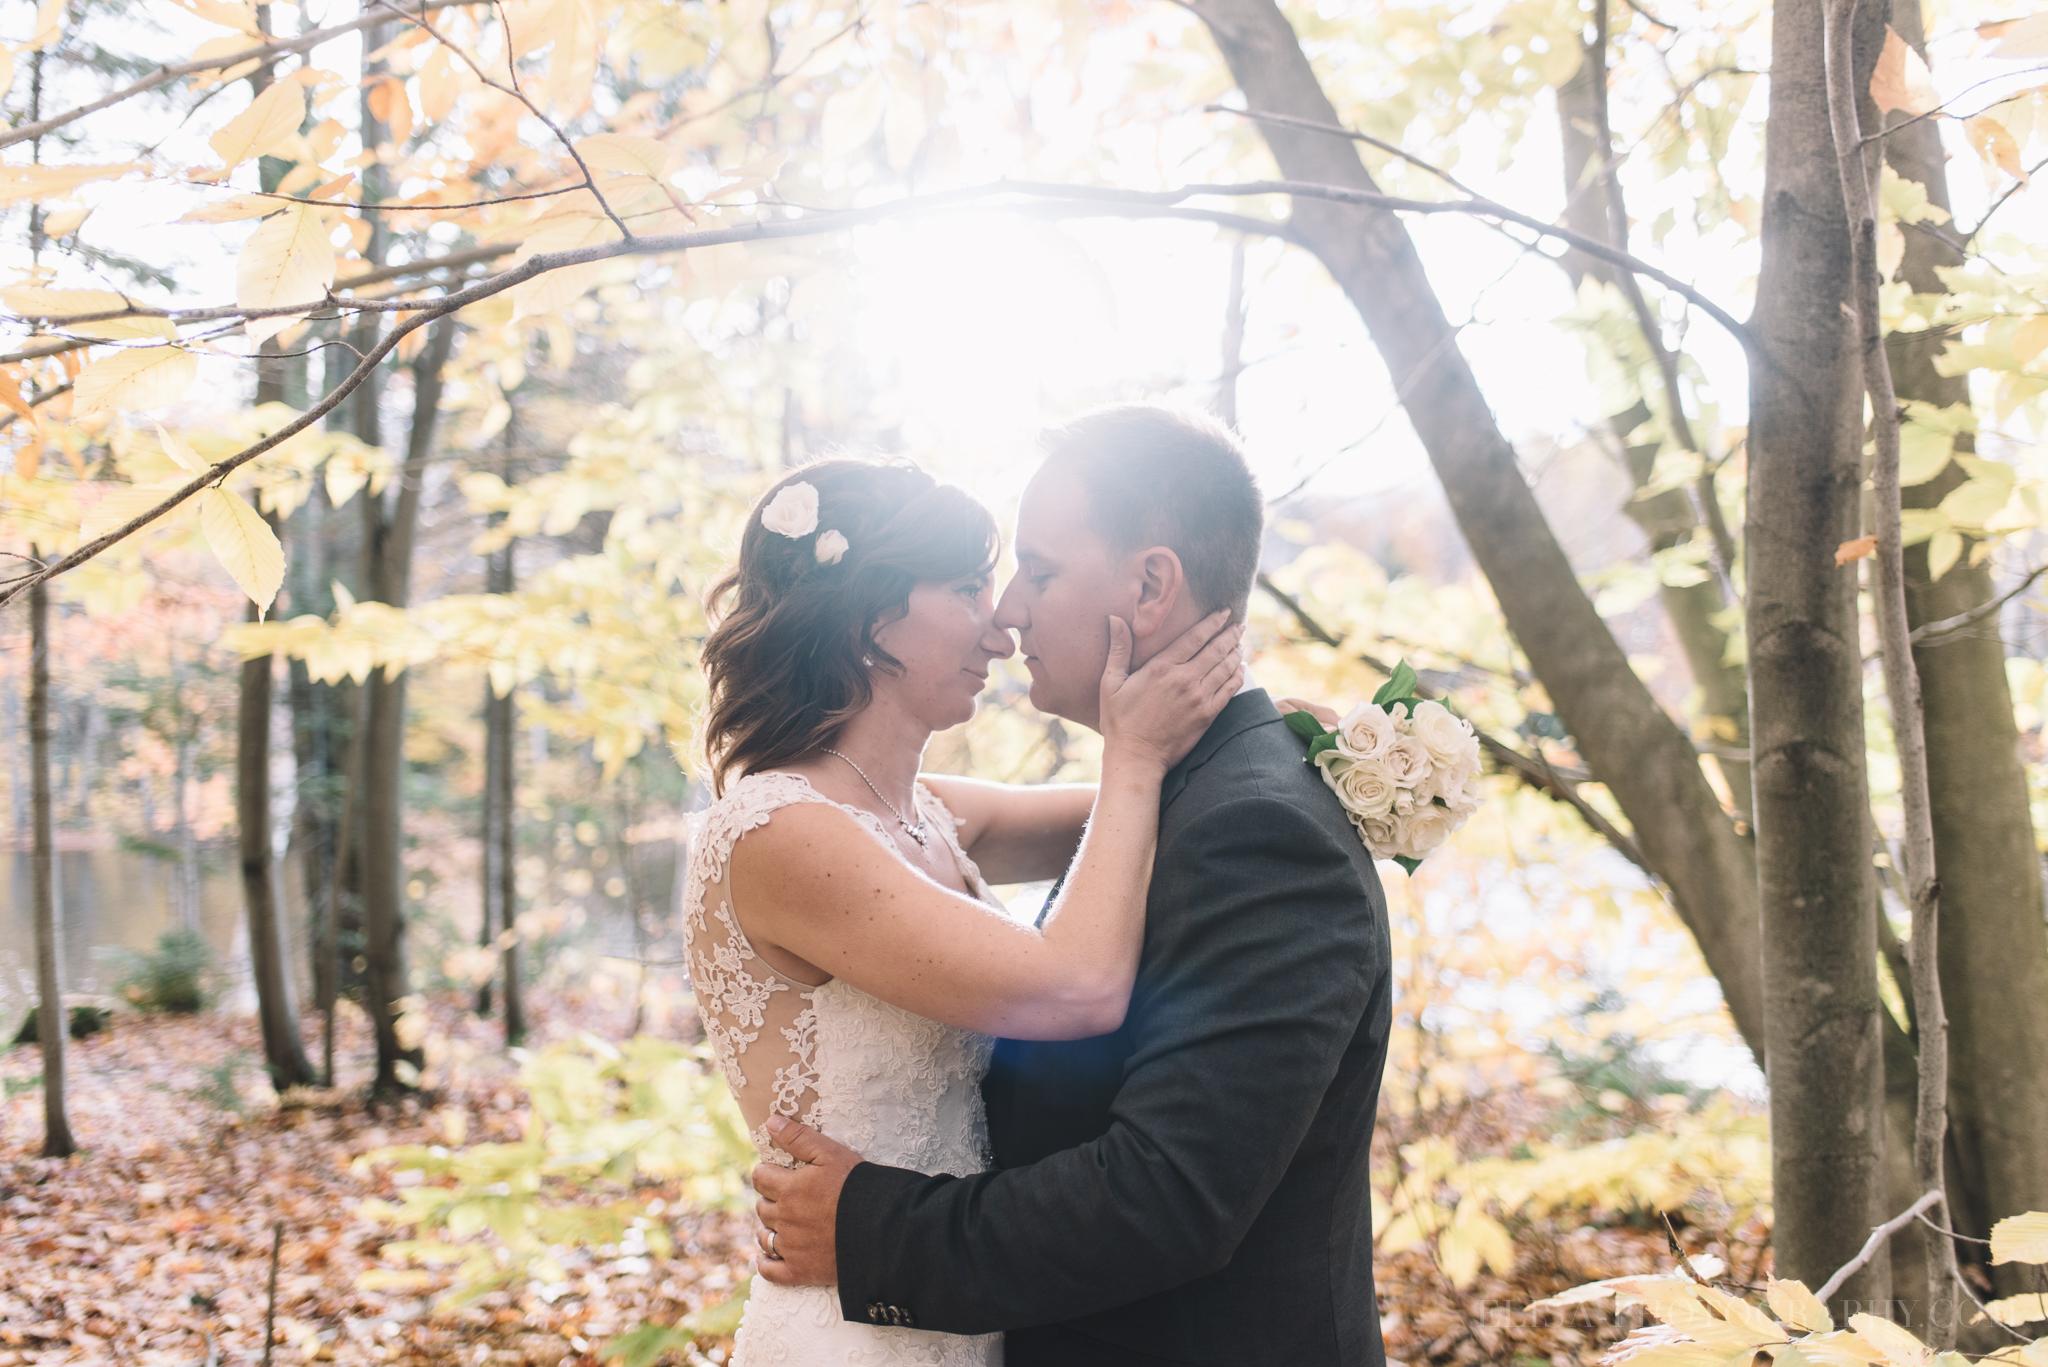 mariage québec baie de beauport automne fall photo 2020 - Mariage à la Baie de Beauport: Cindy & Sébastien